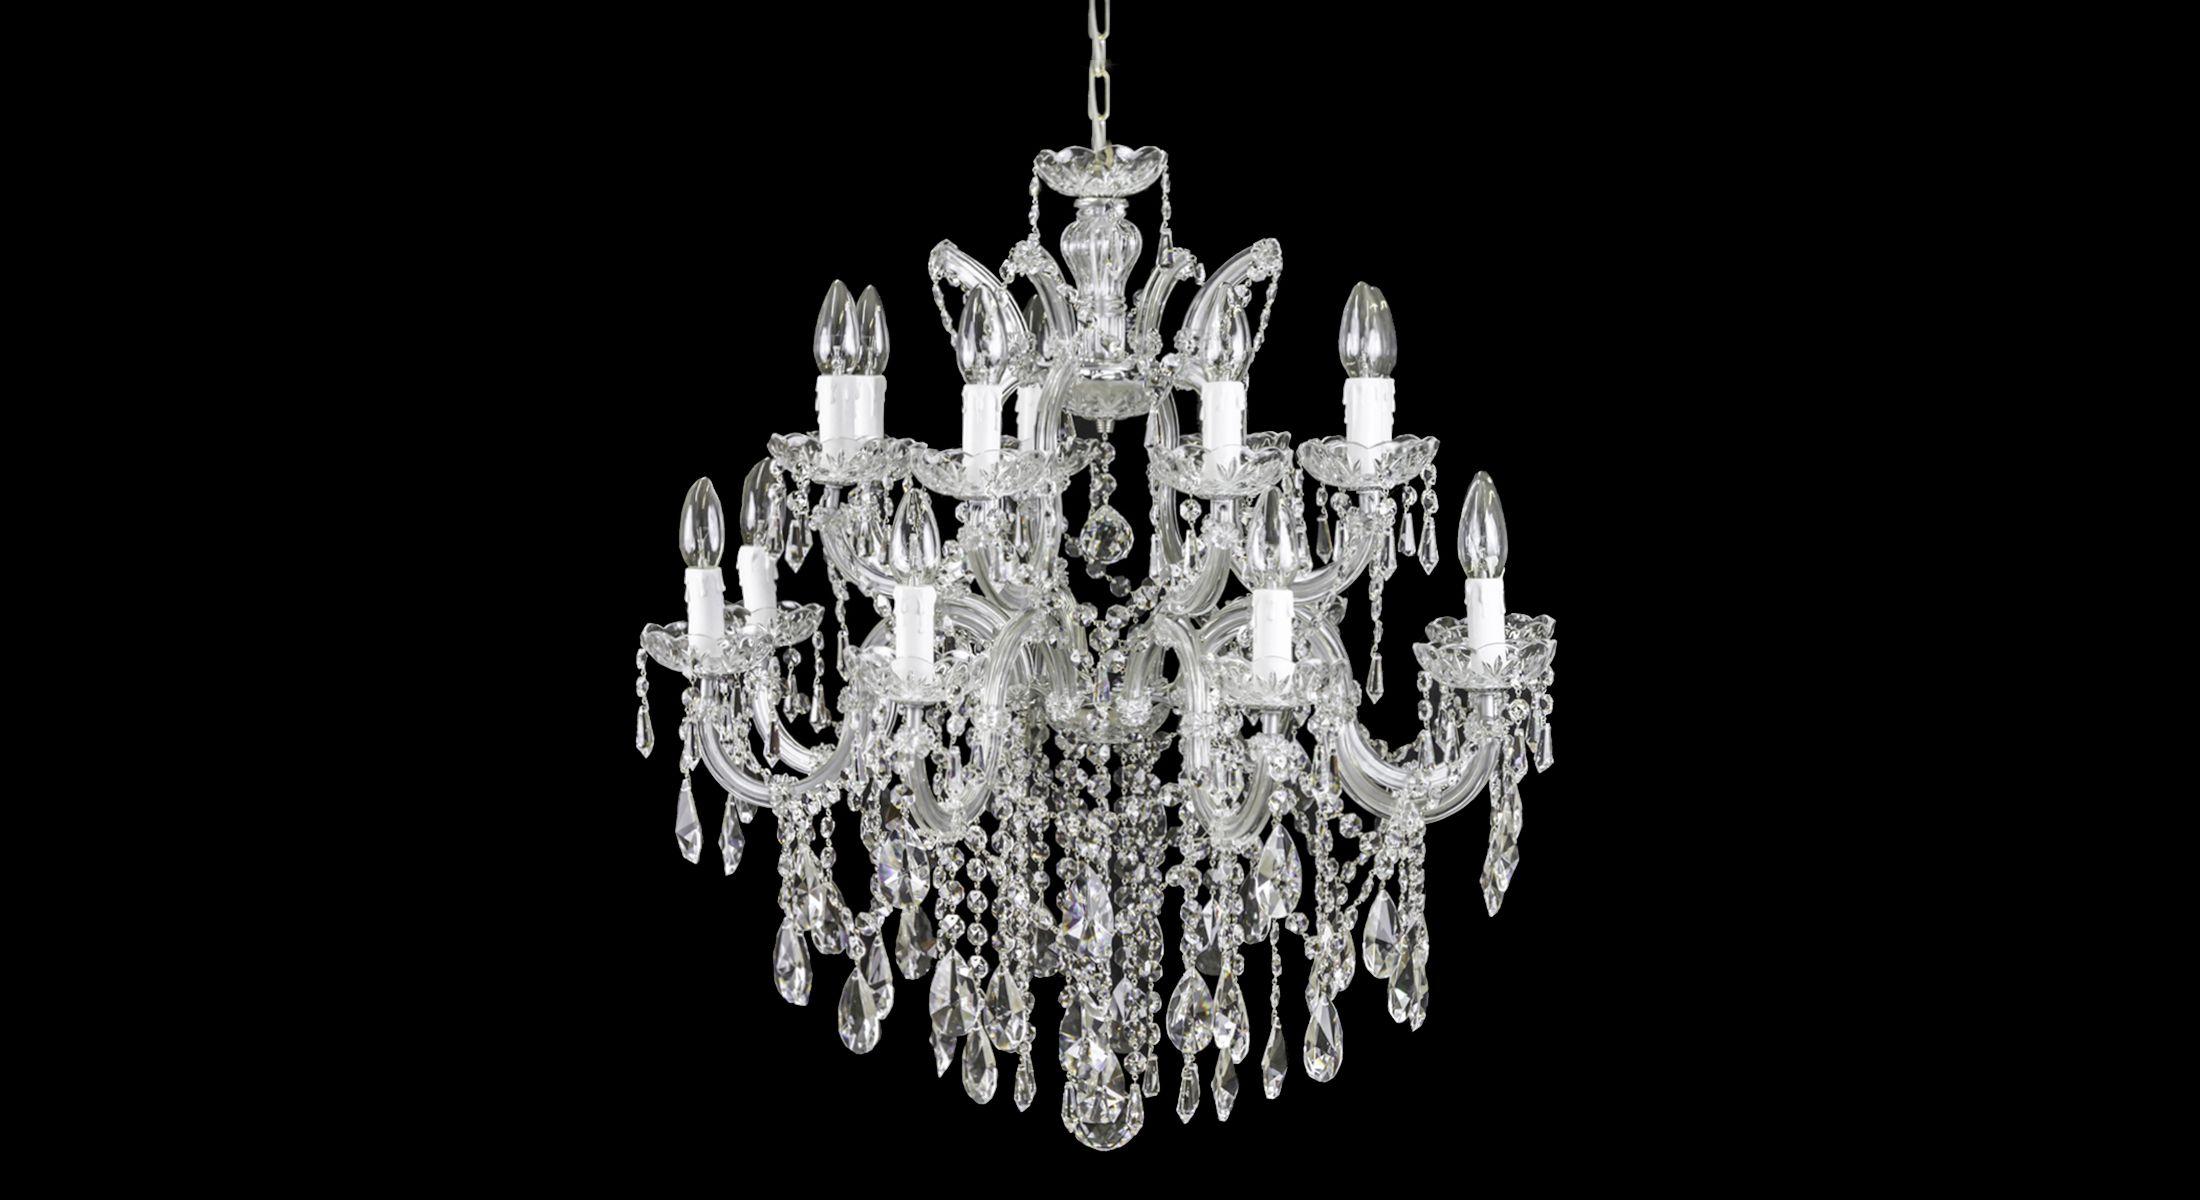 Mod 7888 chandelier luxurychandelier handmade lighting 7888 chandelier luxurychandelier handmade lighting arubaitofo Gallery